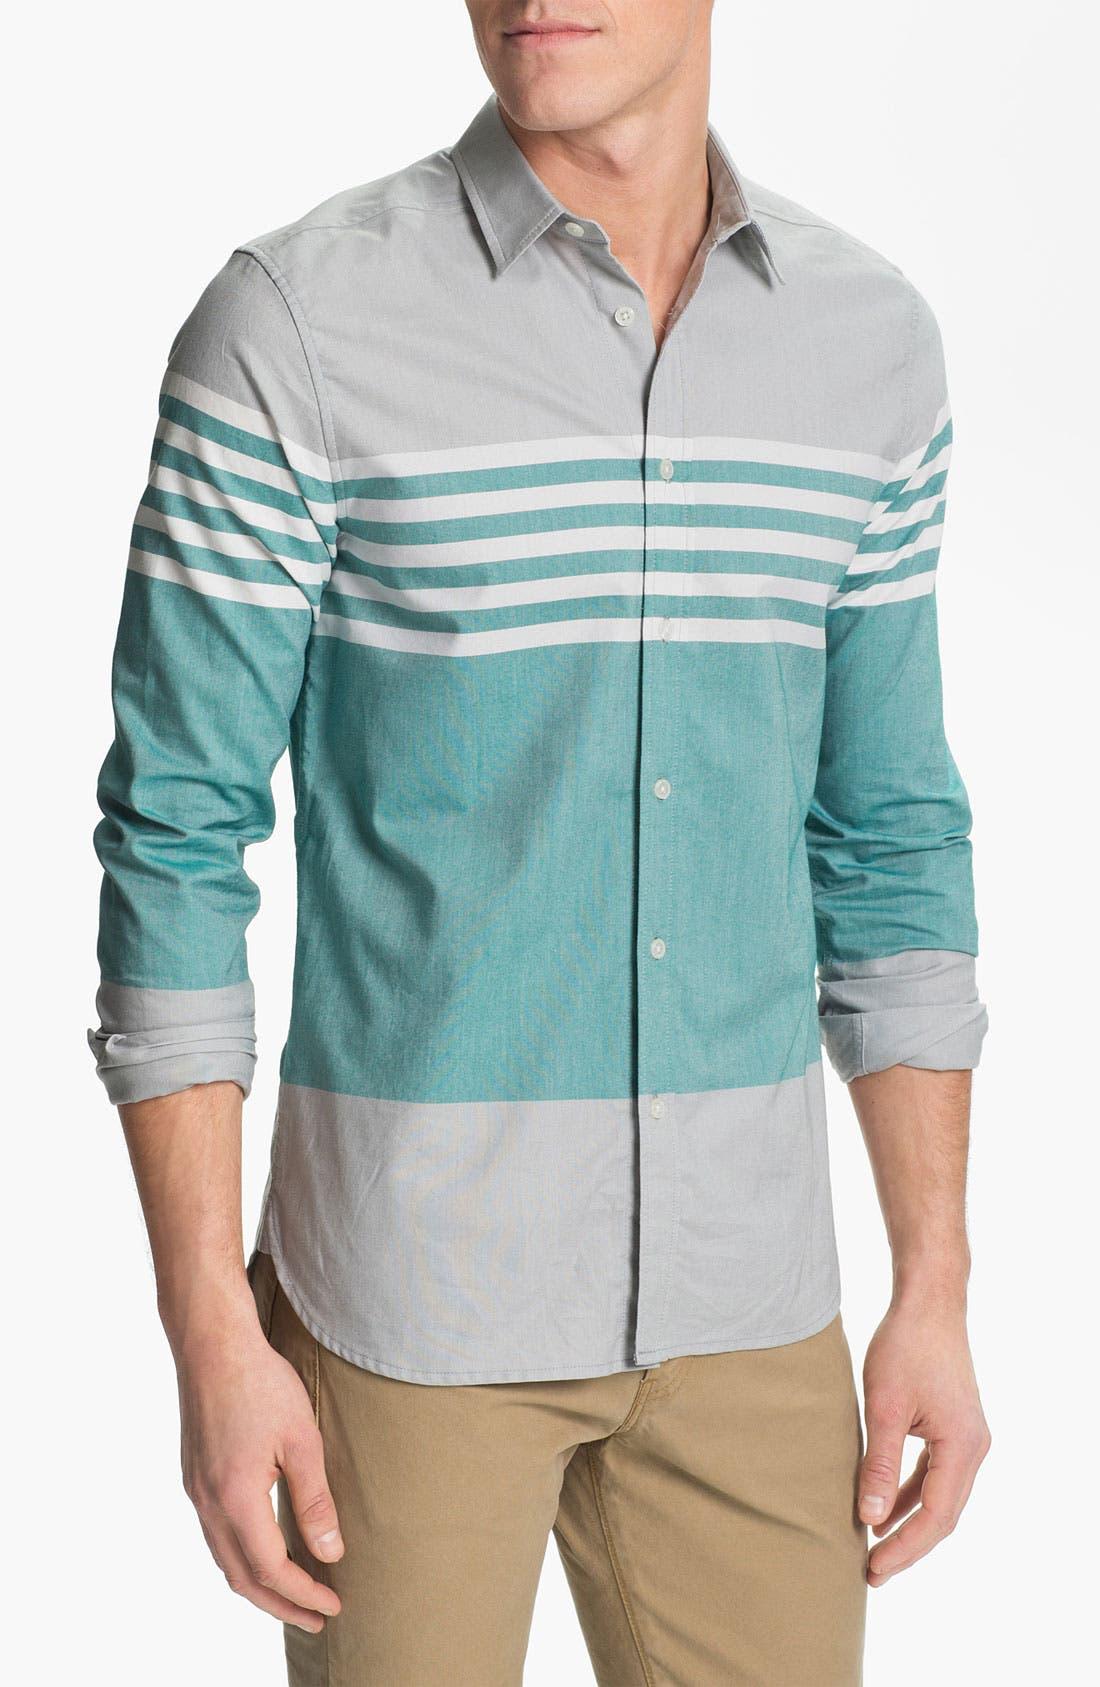 Alternate Image 1 Selected - Edun Colorblock Stripe Woven Shirt